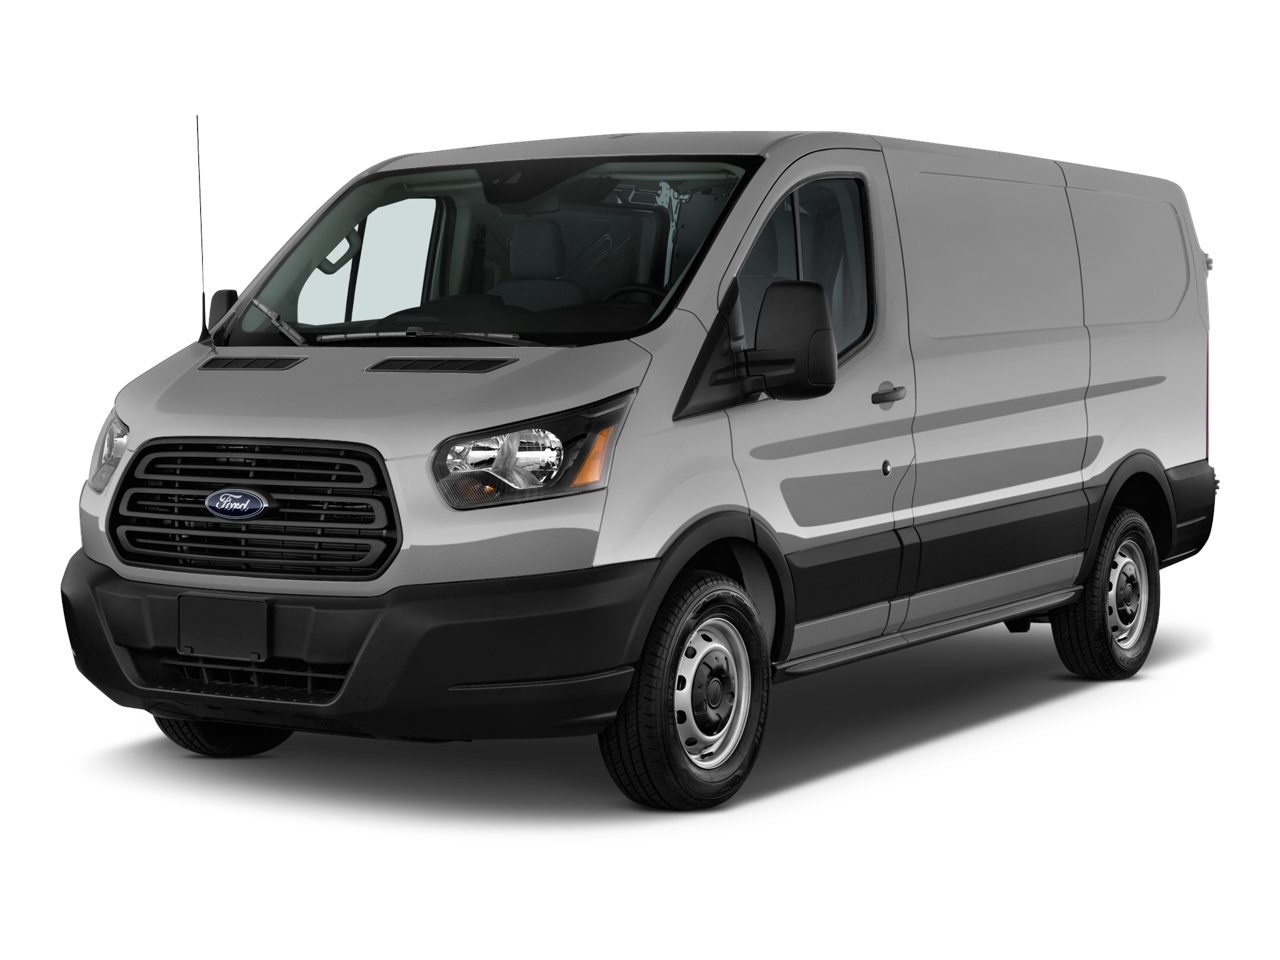 new 2017 ford transit cargo t 350 148 el hr near old bridge nj all american commercial trucks. Black Bedroom Furniture Sets. Home Design Ideas